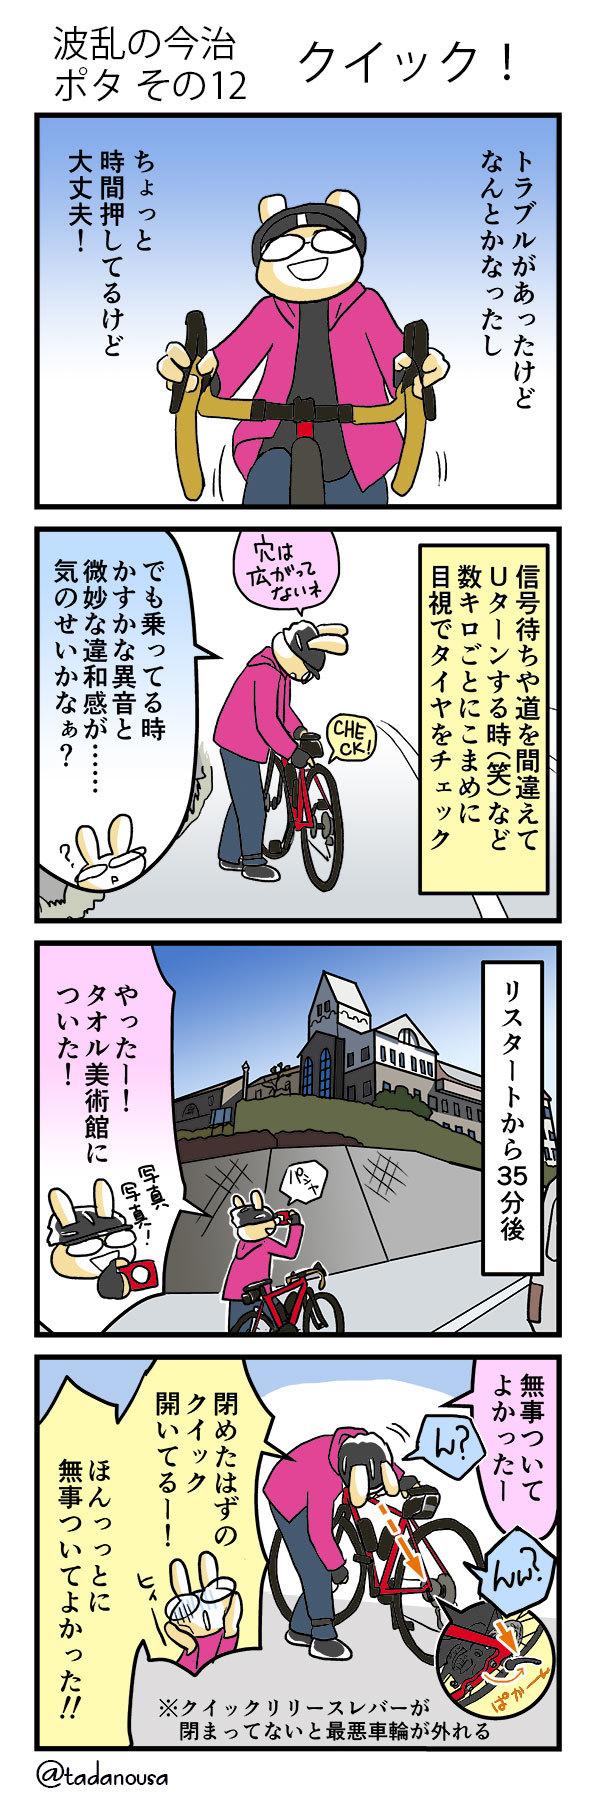 bike_4koma_RB20200223_12_s.jpg